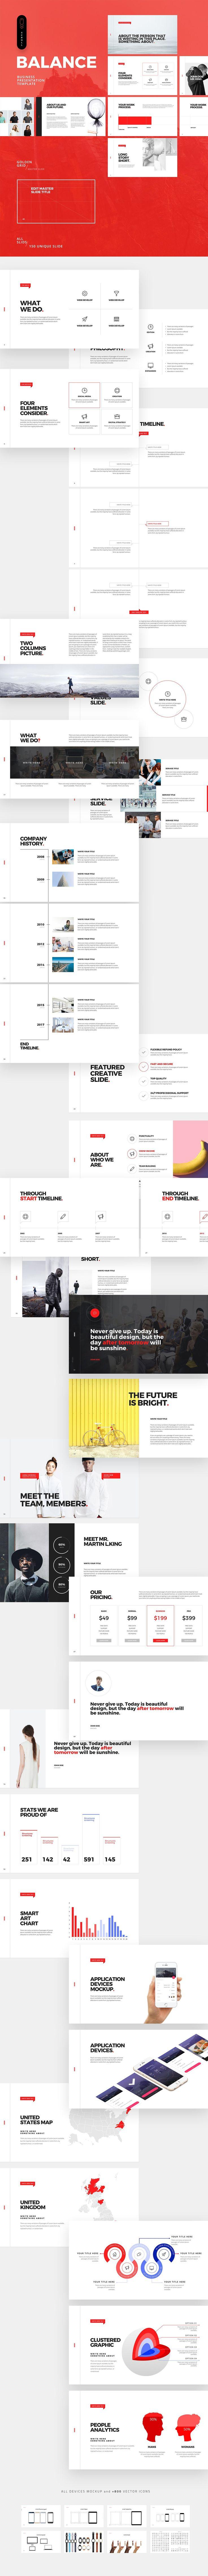 Balance Business Powerpoint by Dublin_Design on @creativemarket